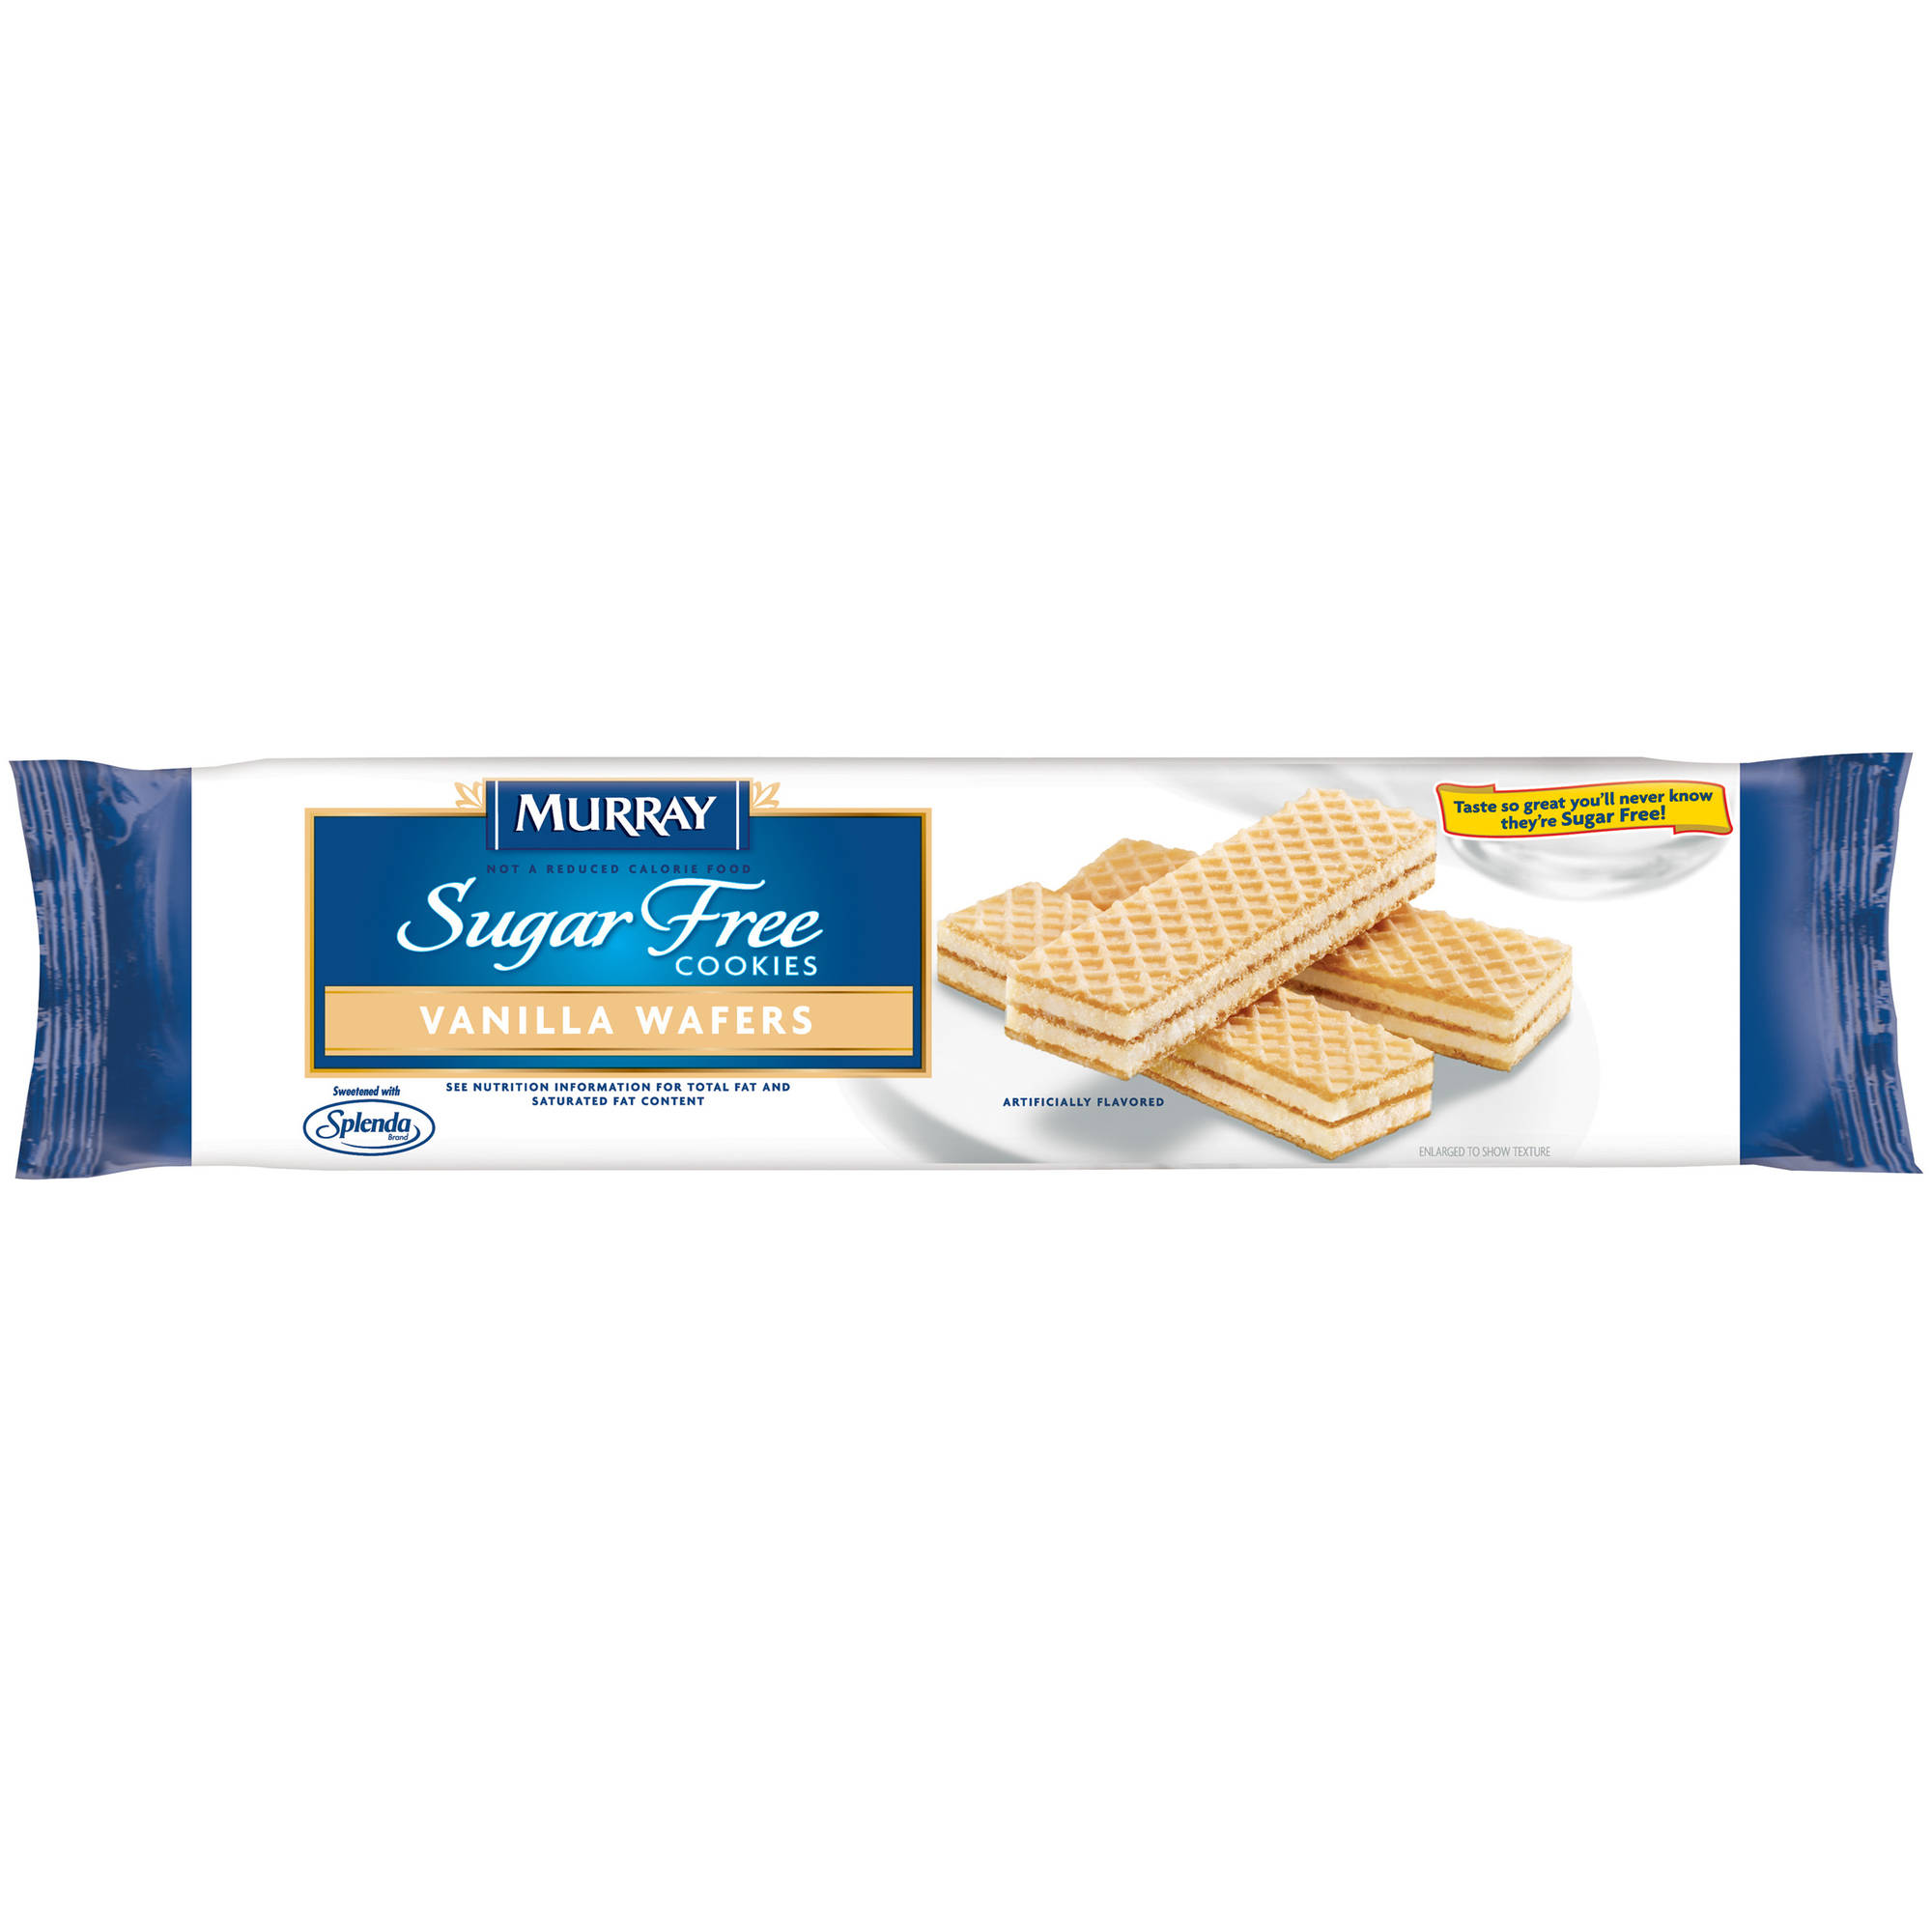 Murray Vanilla Wafers Sugar Free Cookies, 9 oz